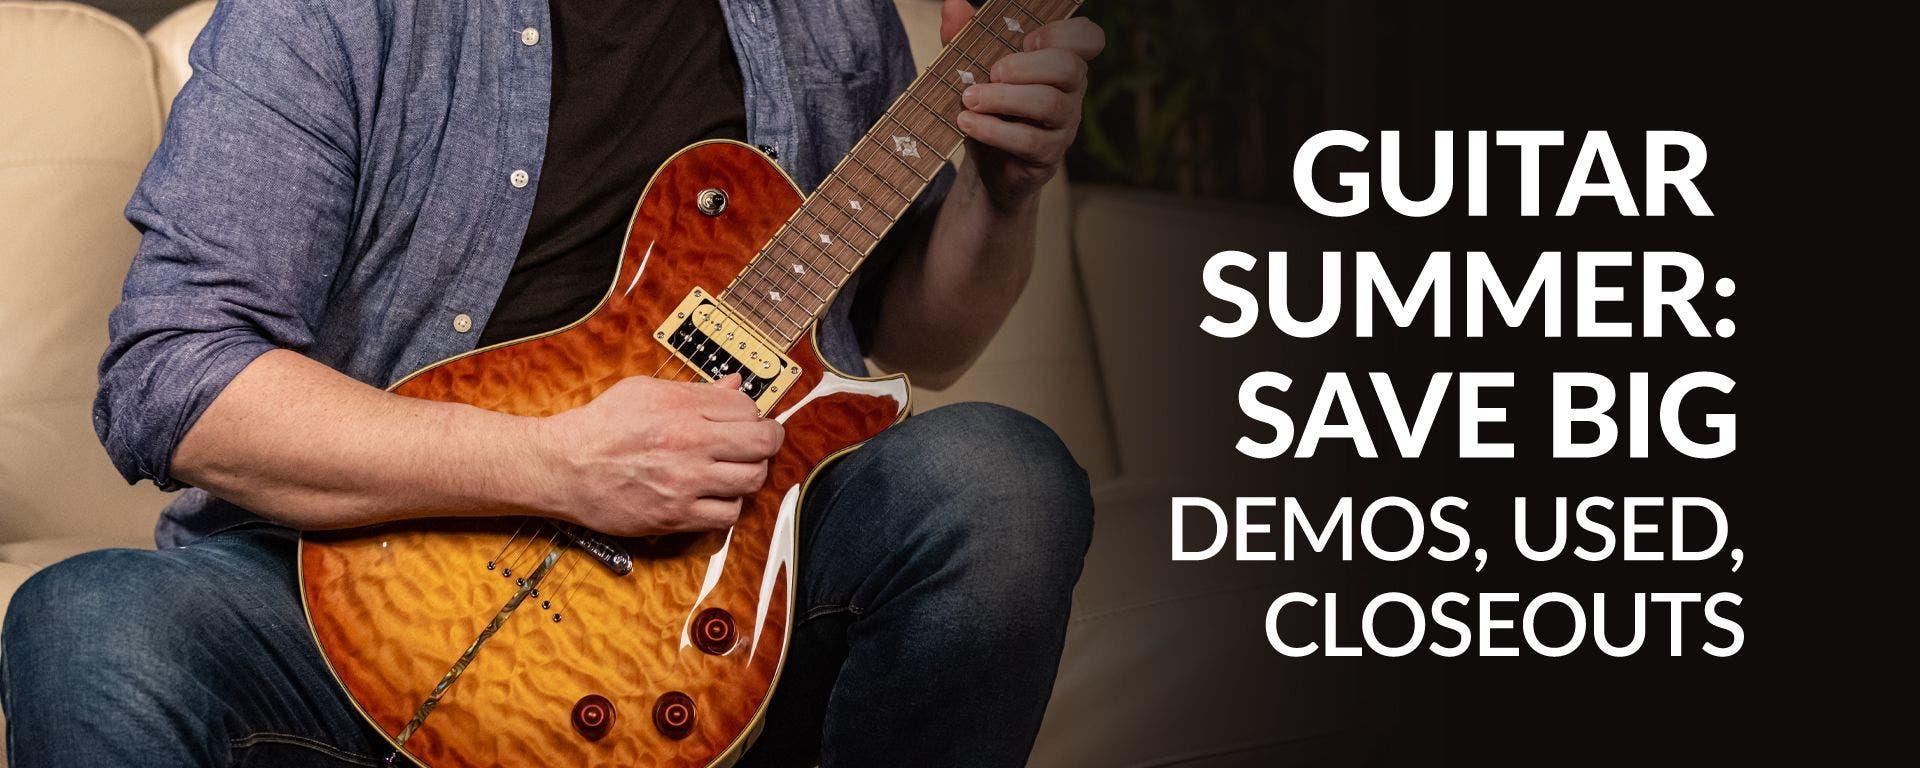 Summer Guitar Sale at Sam Ash